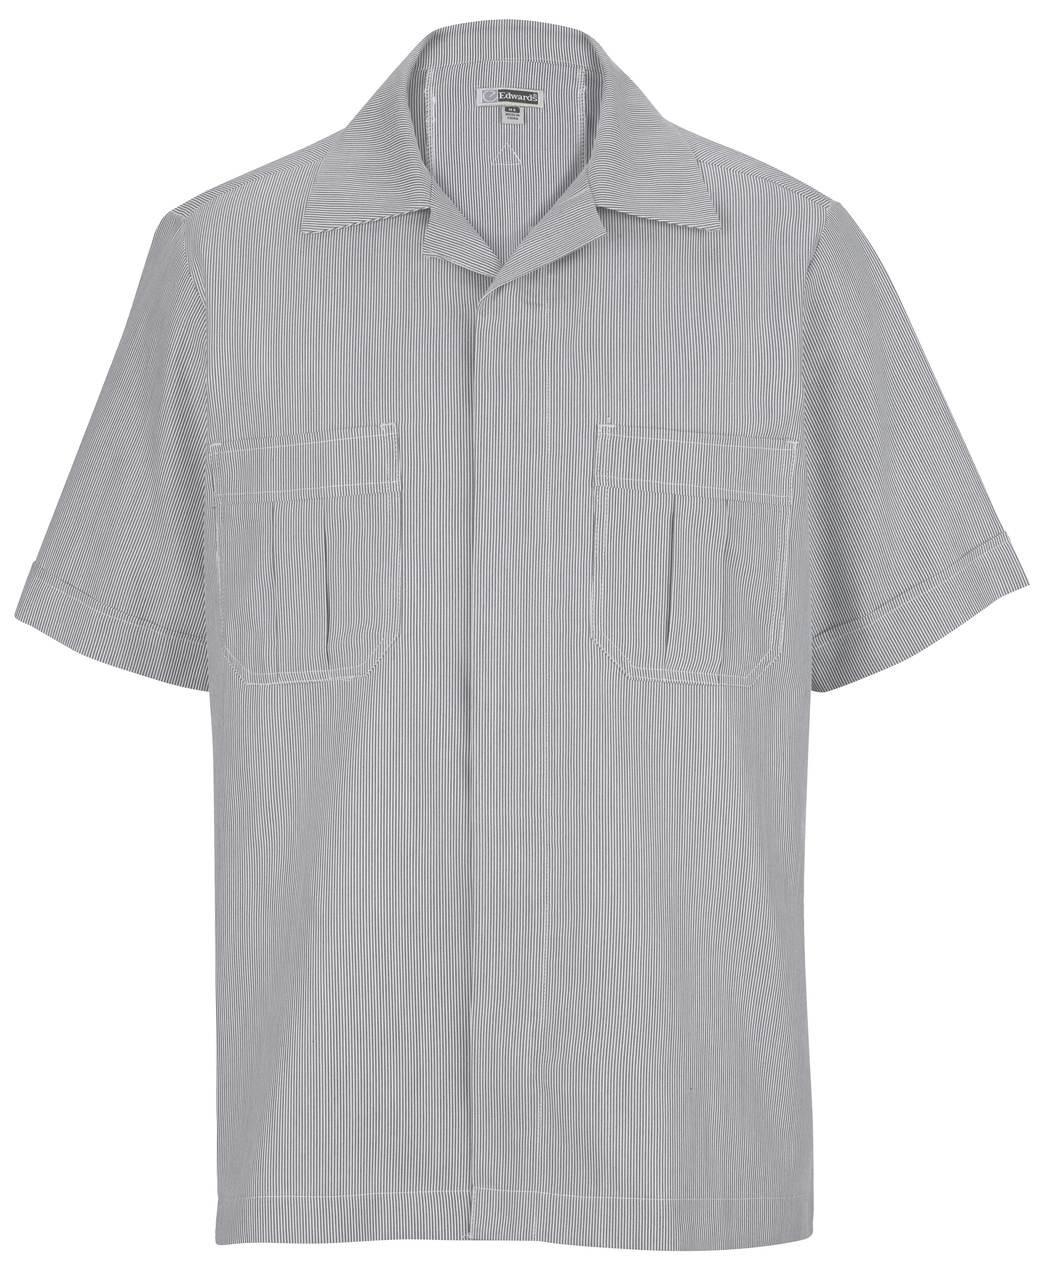 Edwards Garment Men's Junior Cord Service Shirt CLOSEOUT No Returns